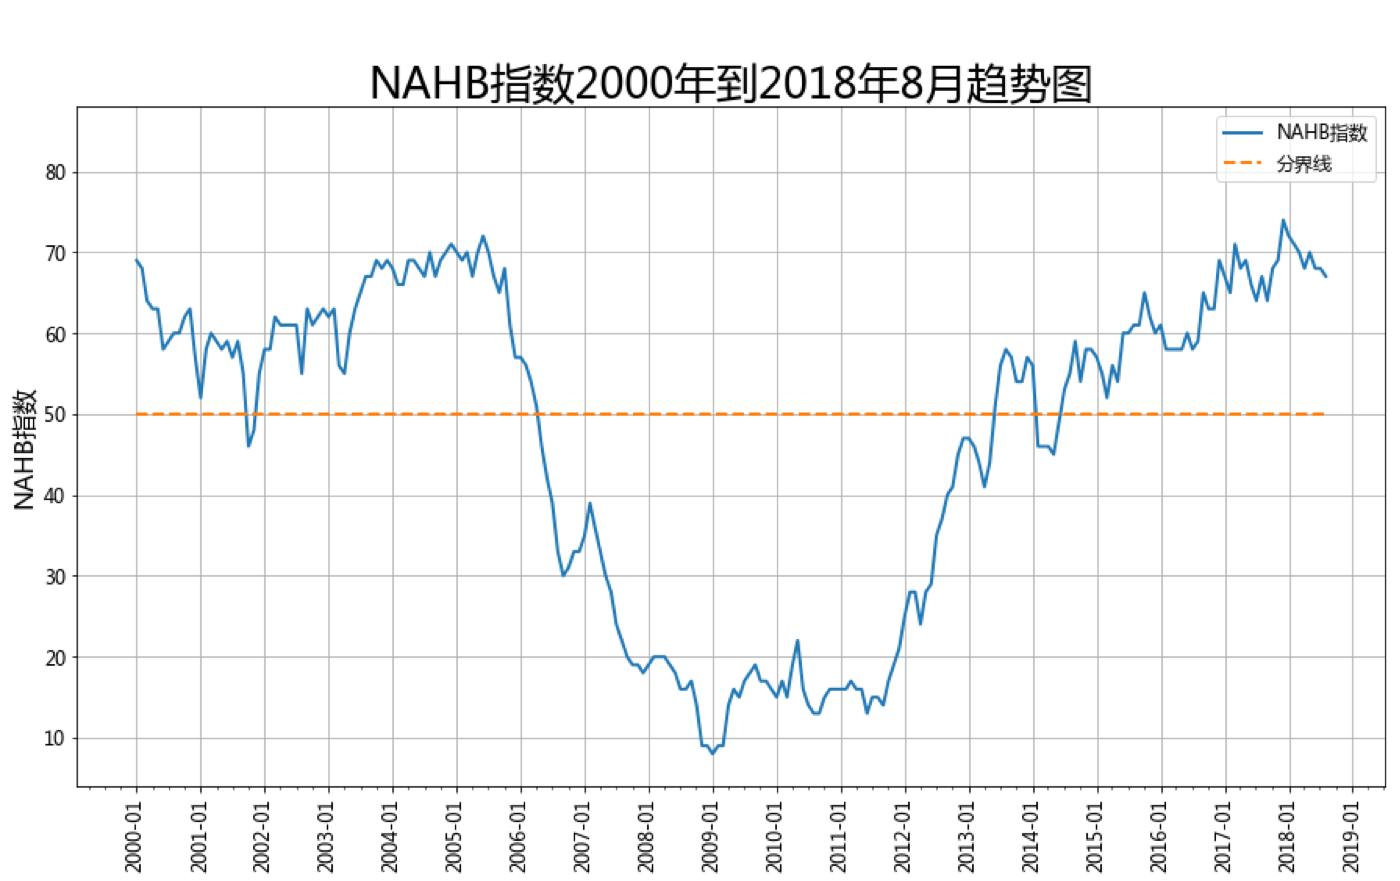 NAHB指数2000年到2018年8月趋势图